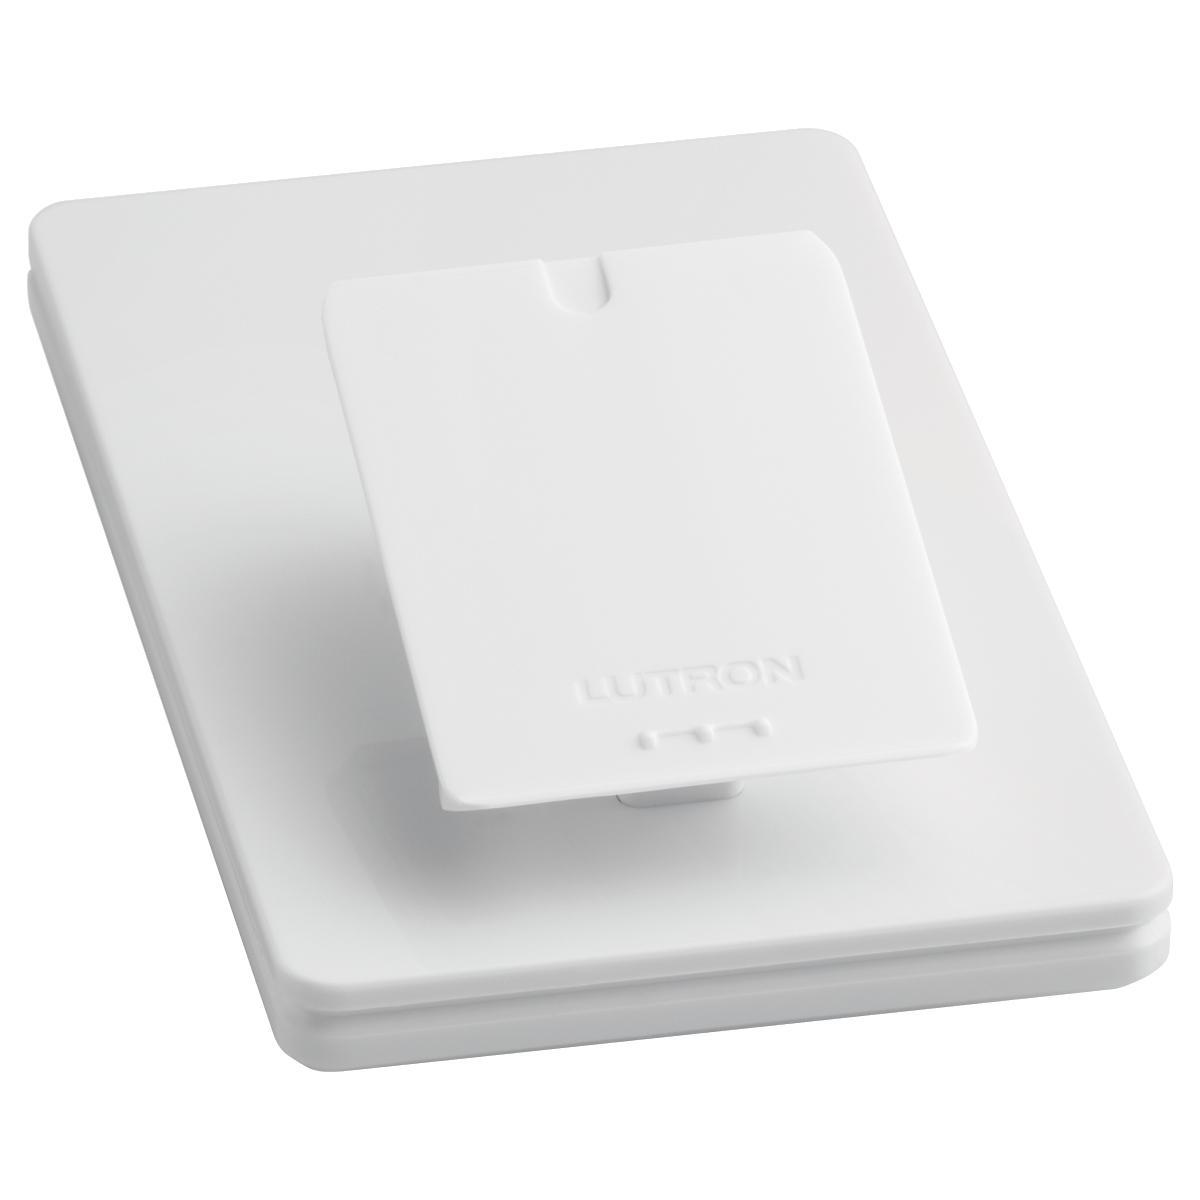 lutron caseta wireless smart lighting in wall dimmer kit homekit enabled p bdg pkg2w c works. Black Bedroom Furniture Sets. Home Design Ideas